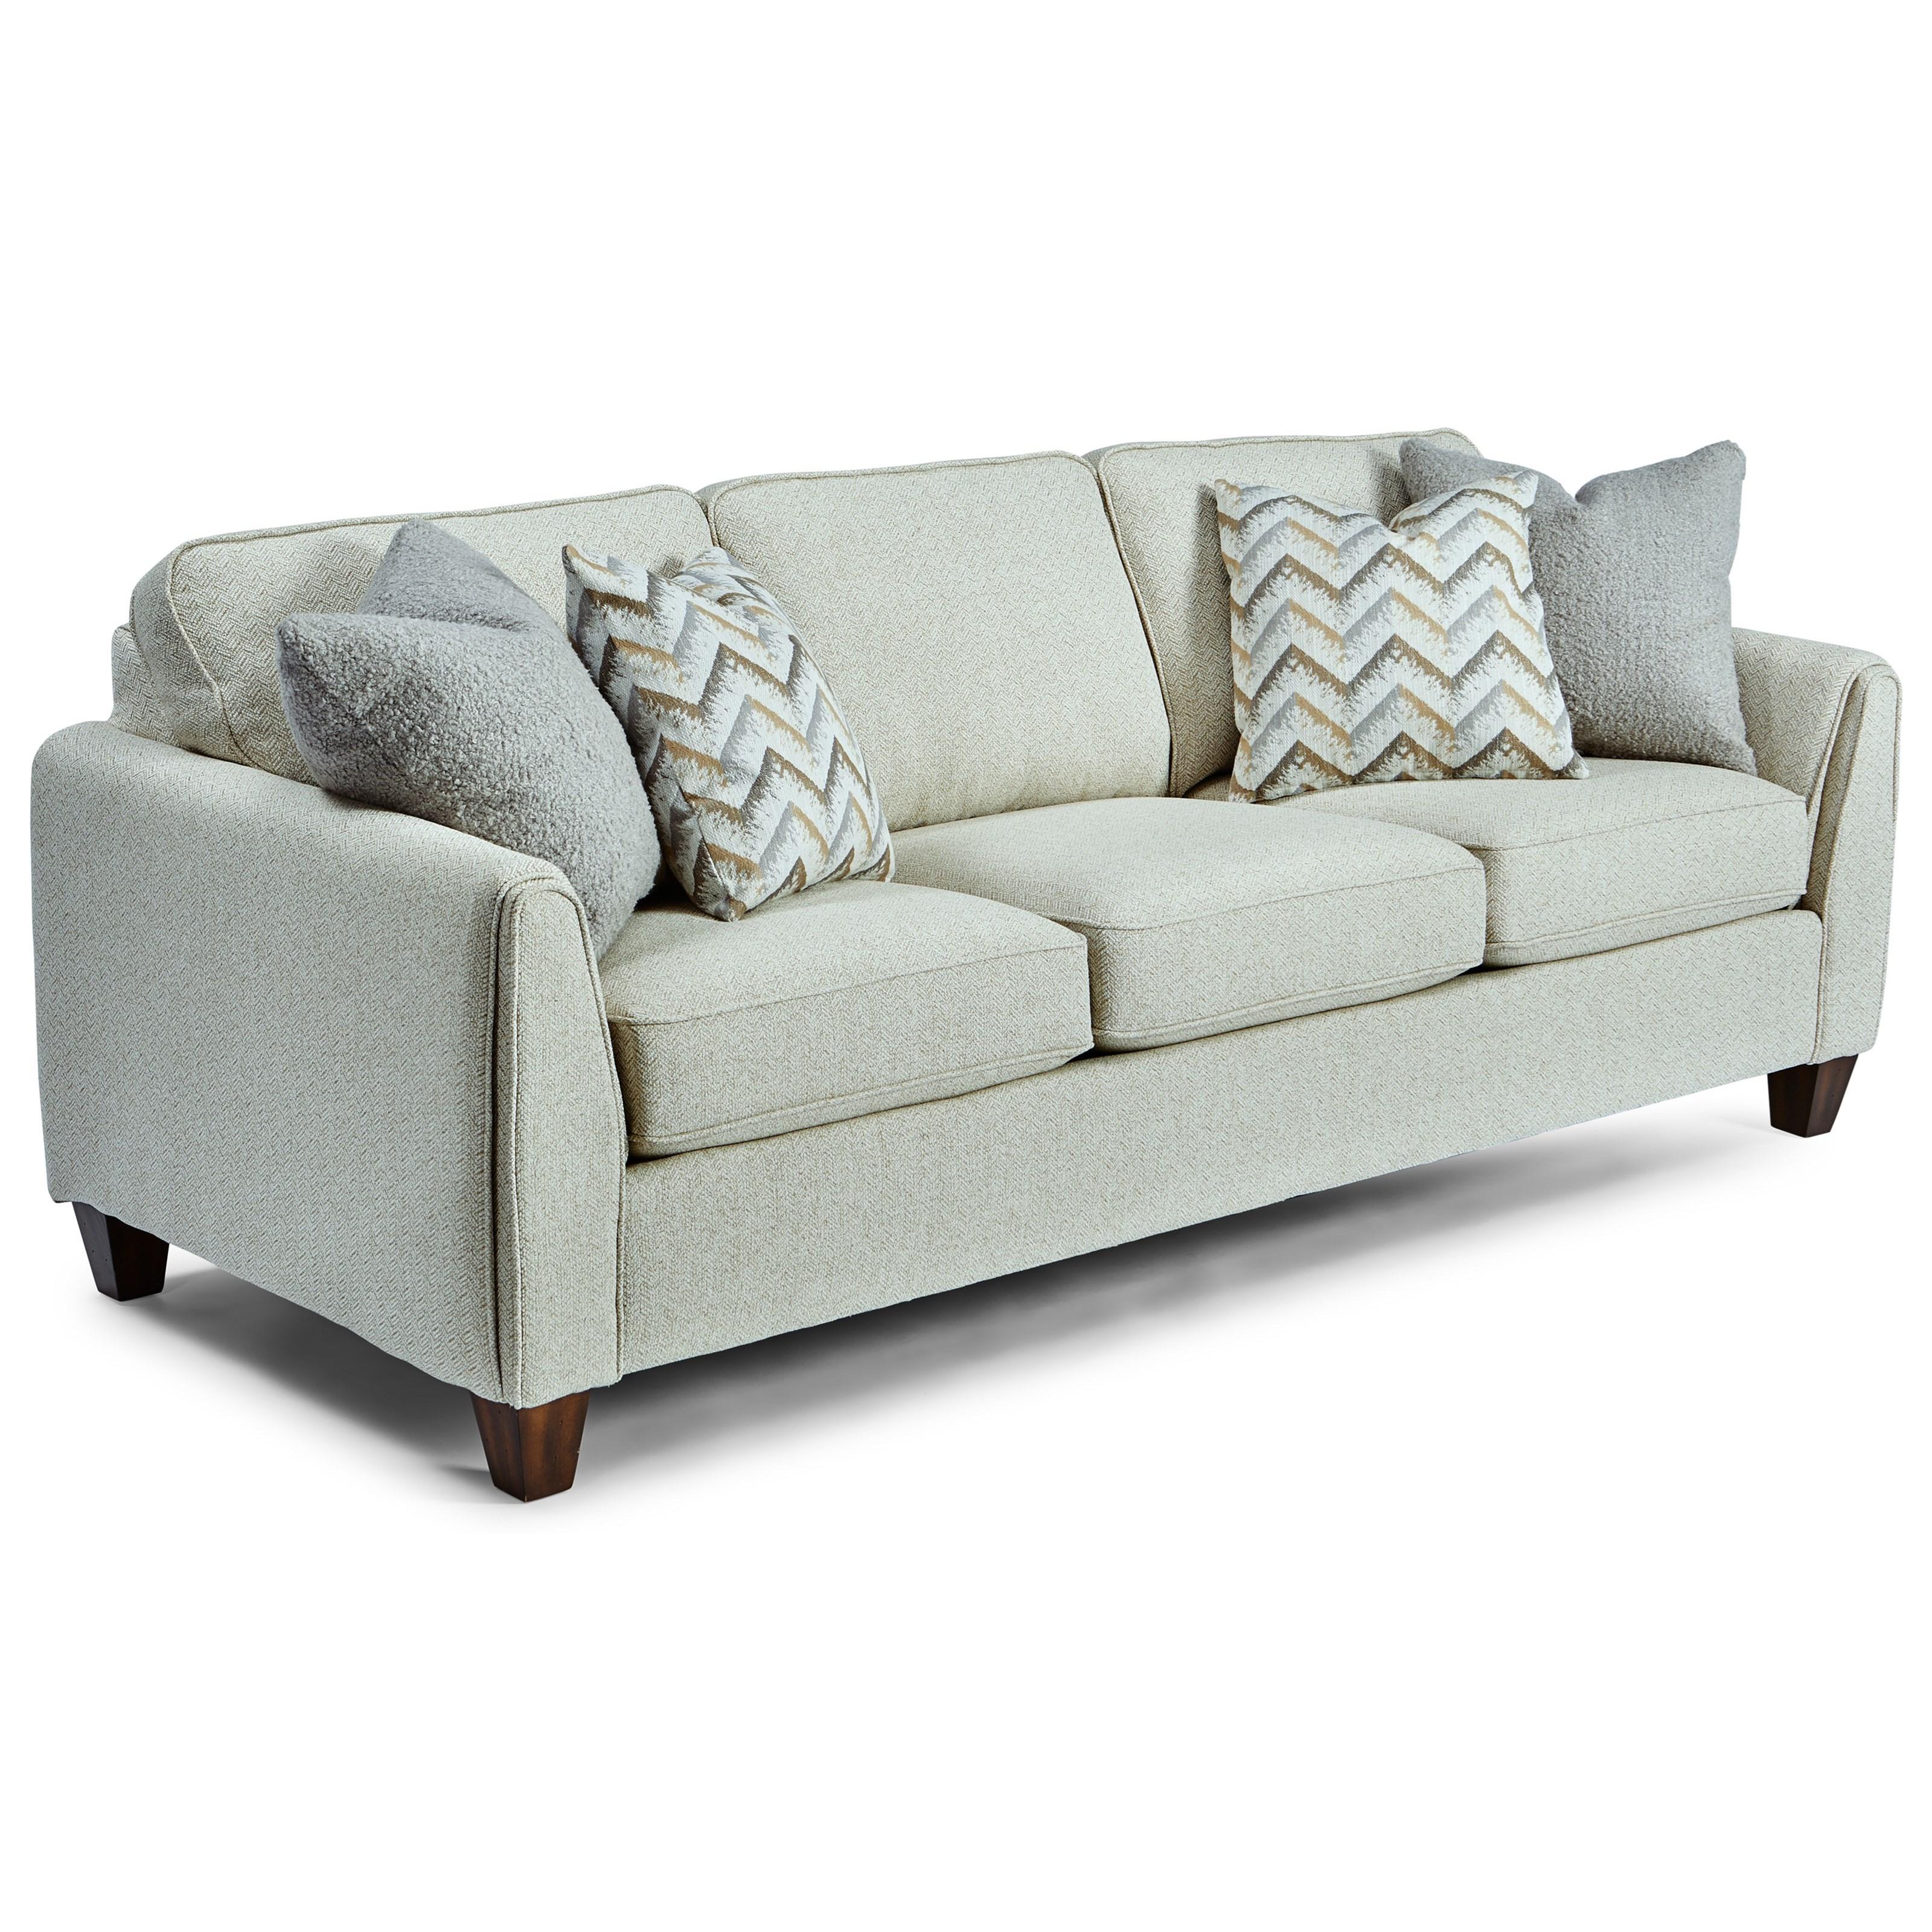 Bryce Sofa by Flexsteel at Jordan's Home Furnishings